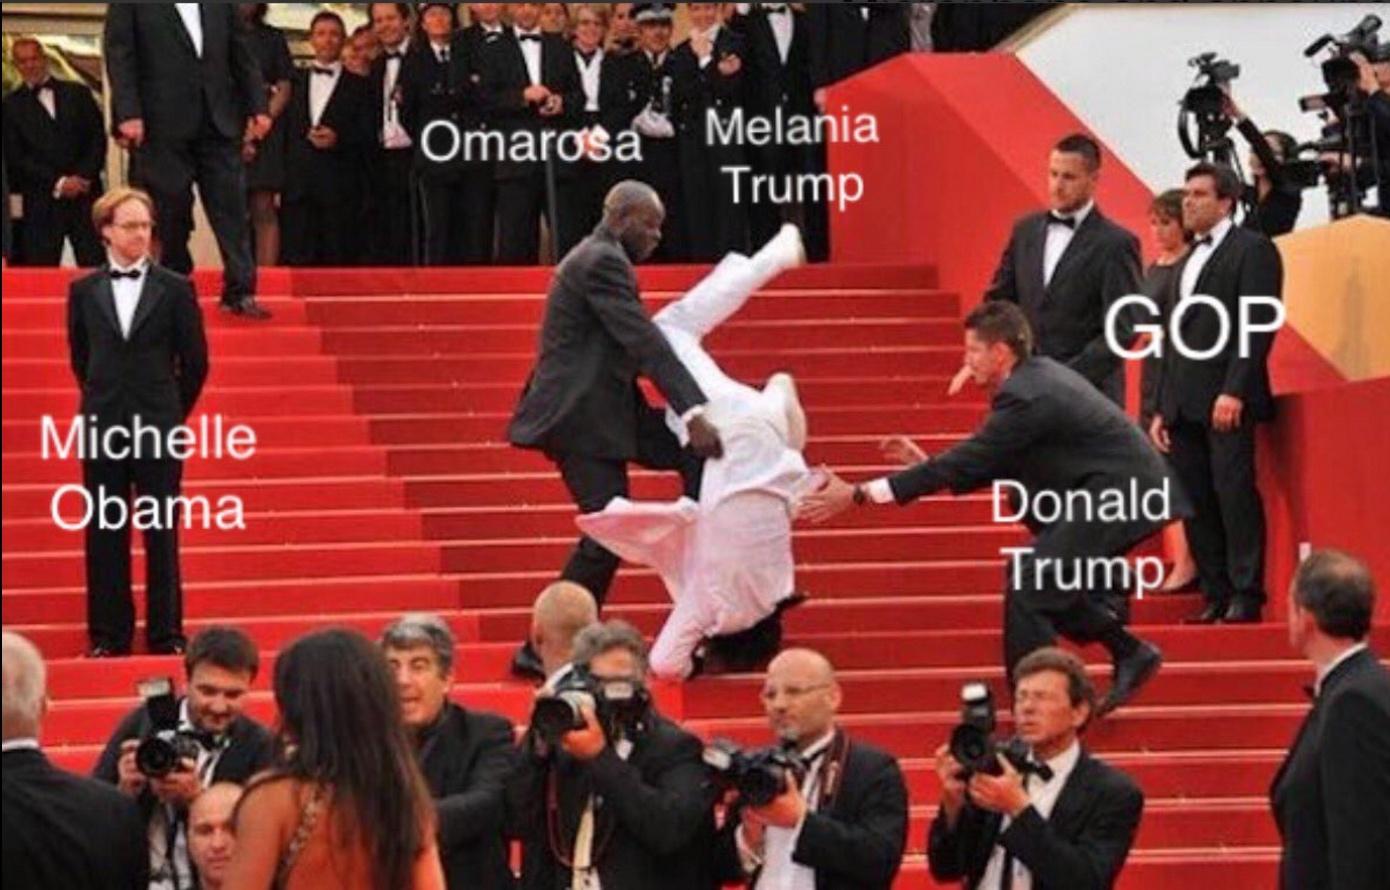 Melania Plagiarized Michelle Obama - Meme 6